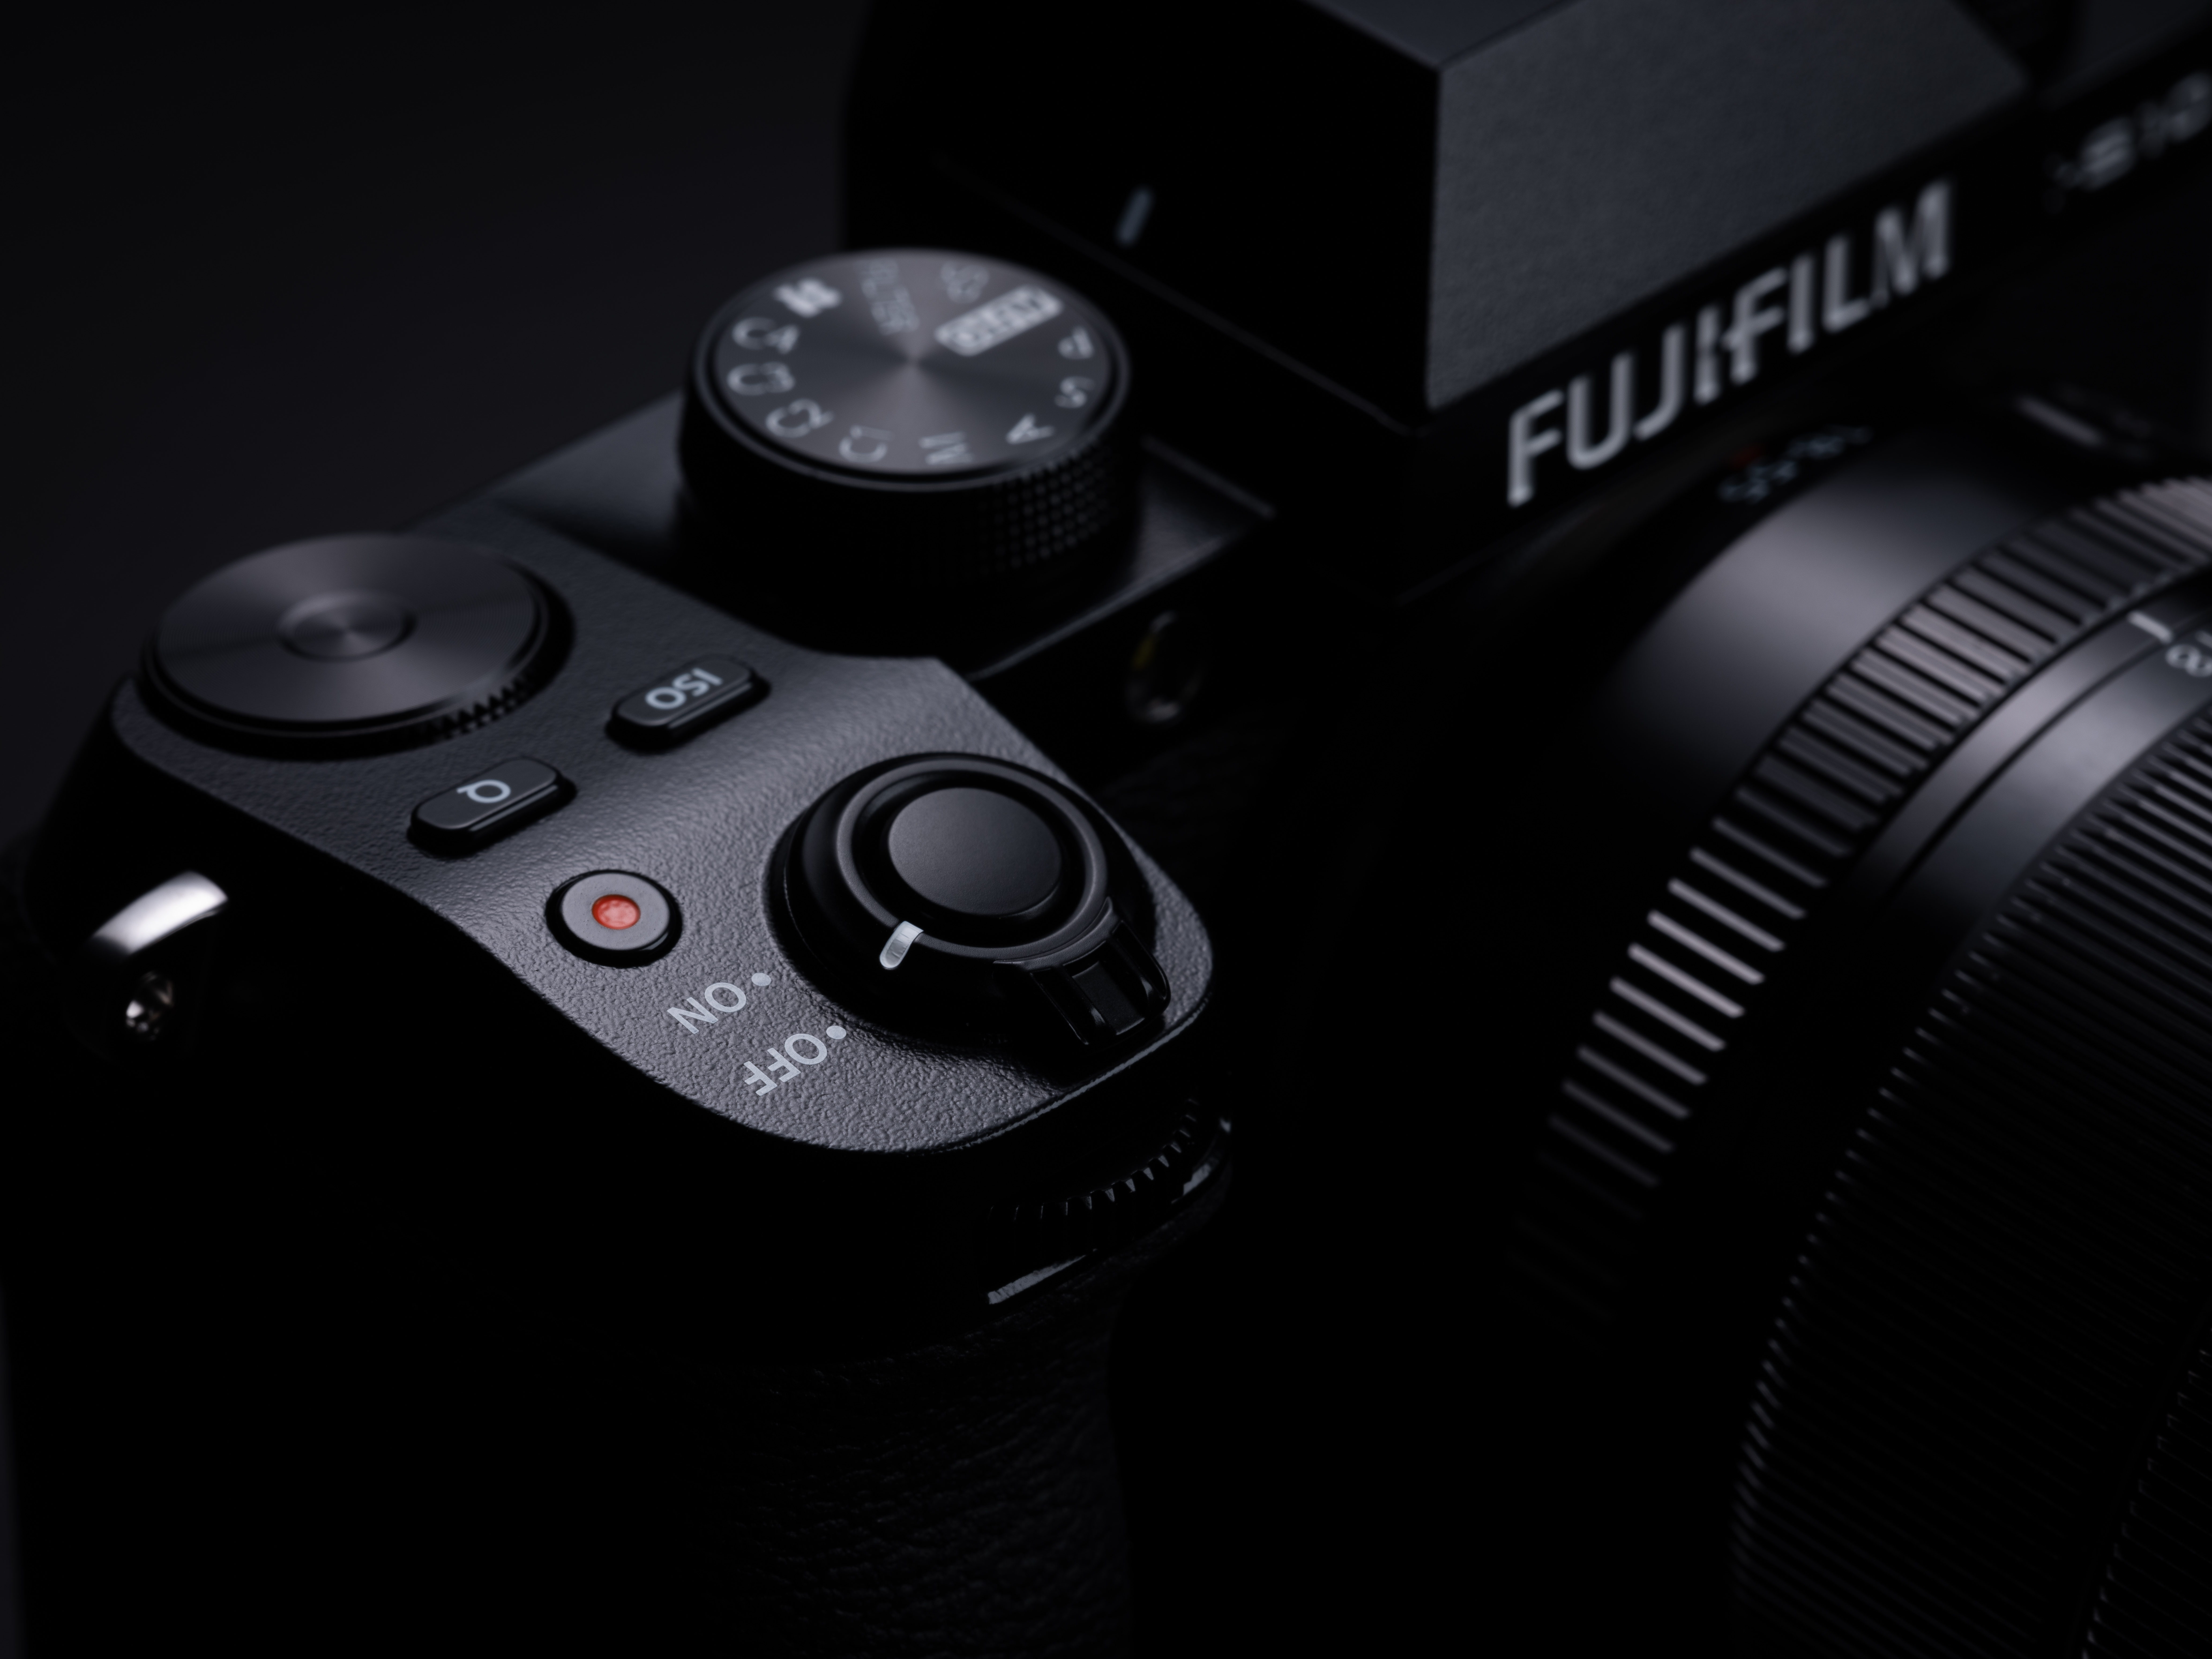 fujifilm x-s10 two